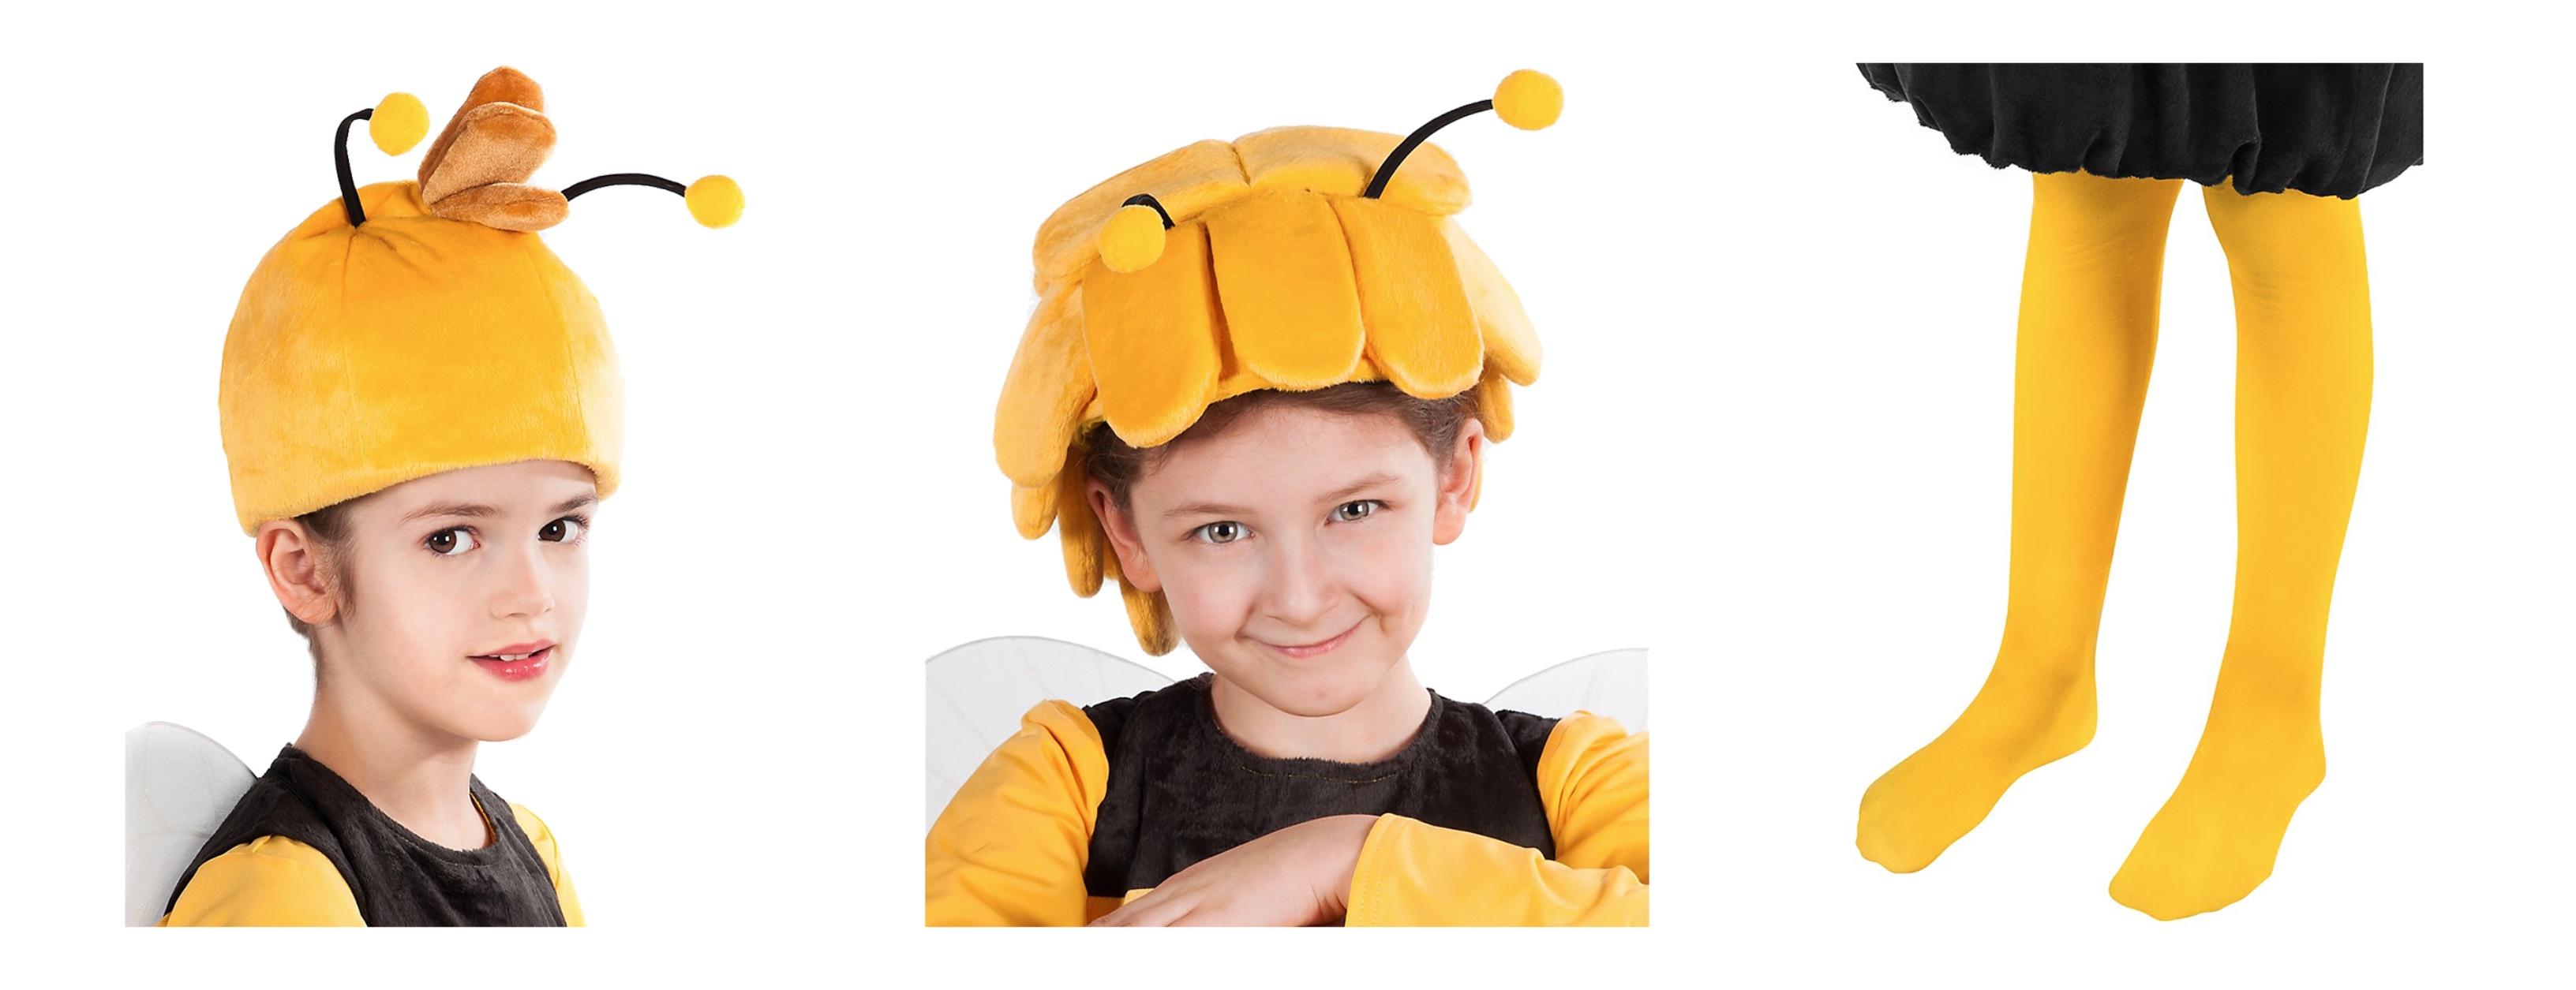 Bien maja børnekostumer - Bien Maja kostume til børn og voksne